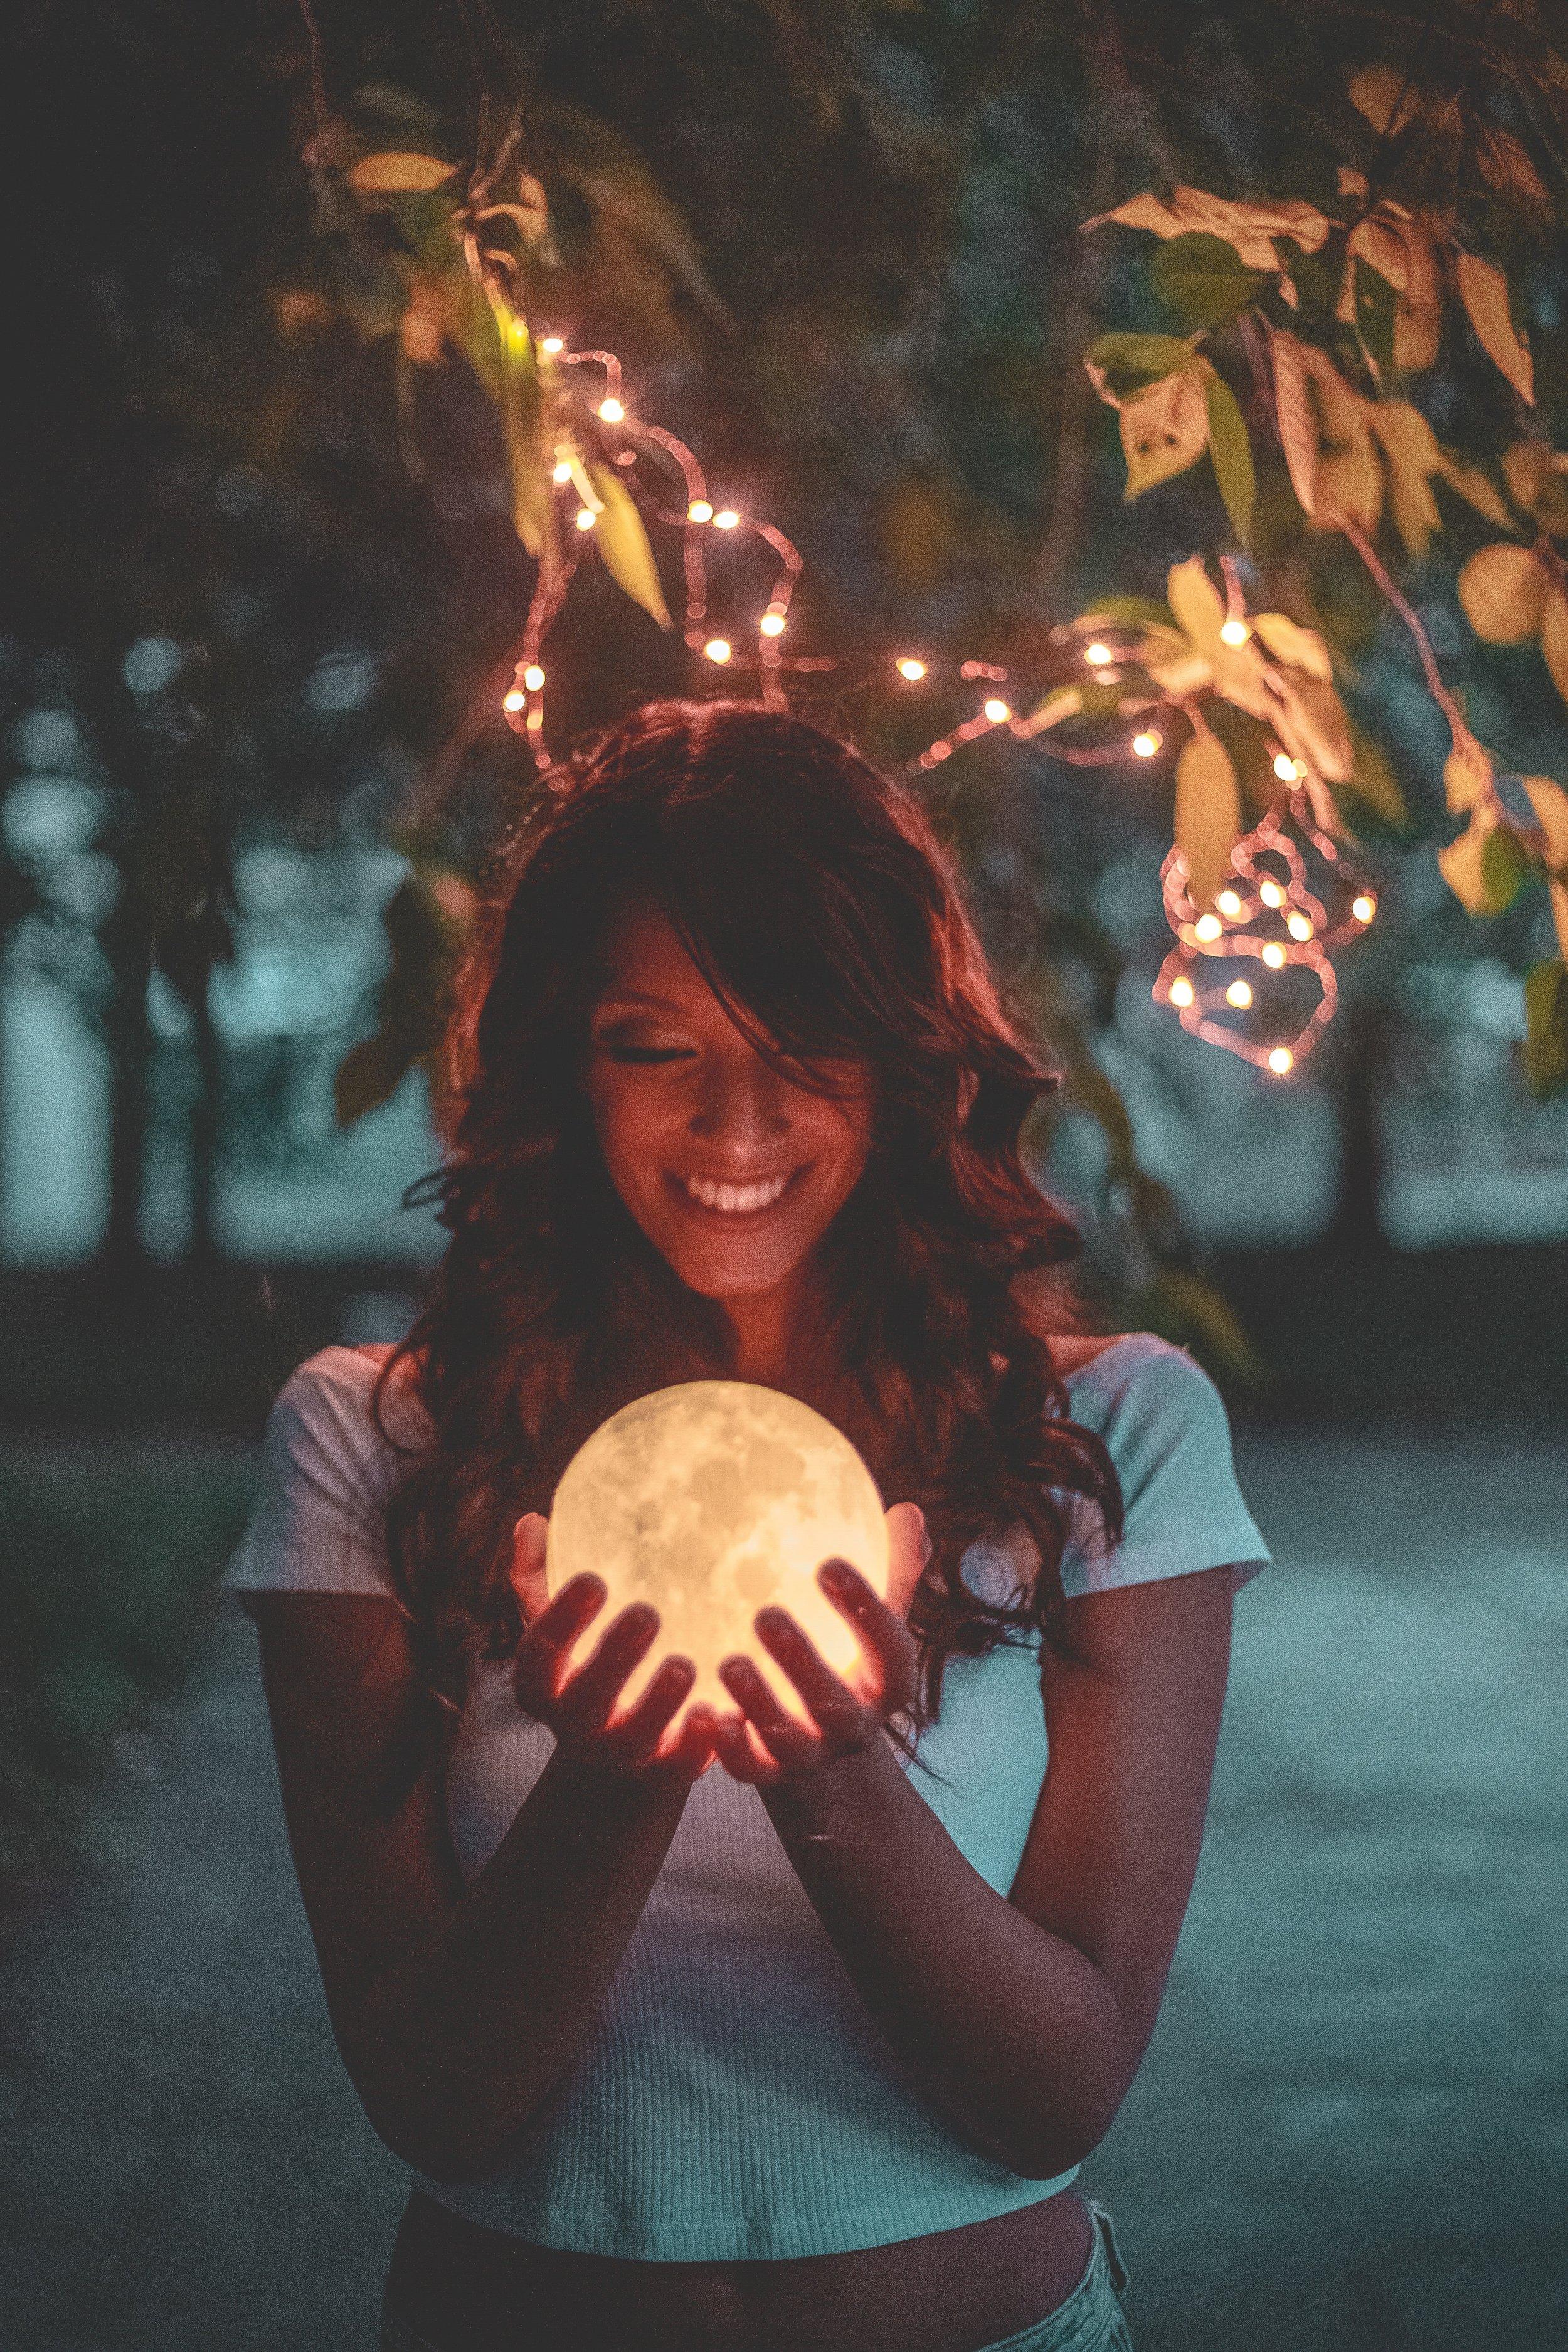 beautiful-crystal-ball-evening-1343259.jpg